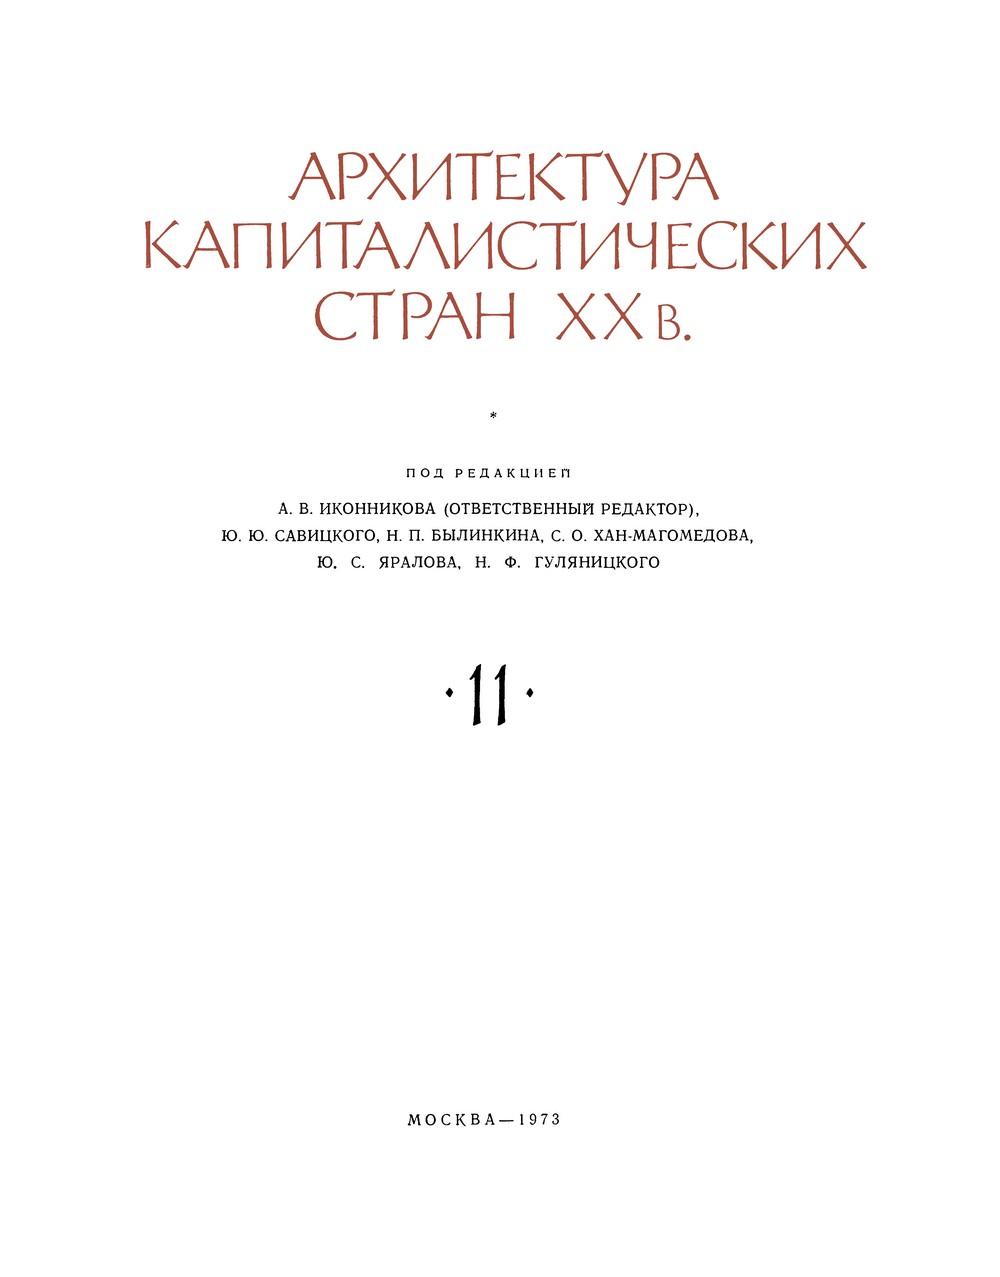 Архитектура капиталистических стран о швидковский с хан-магомедов